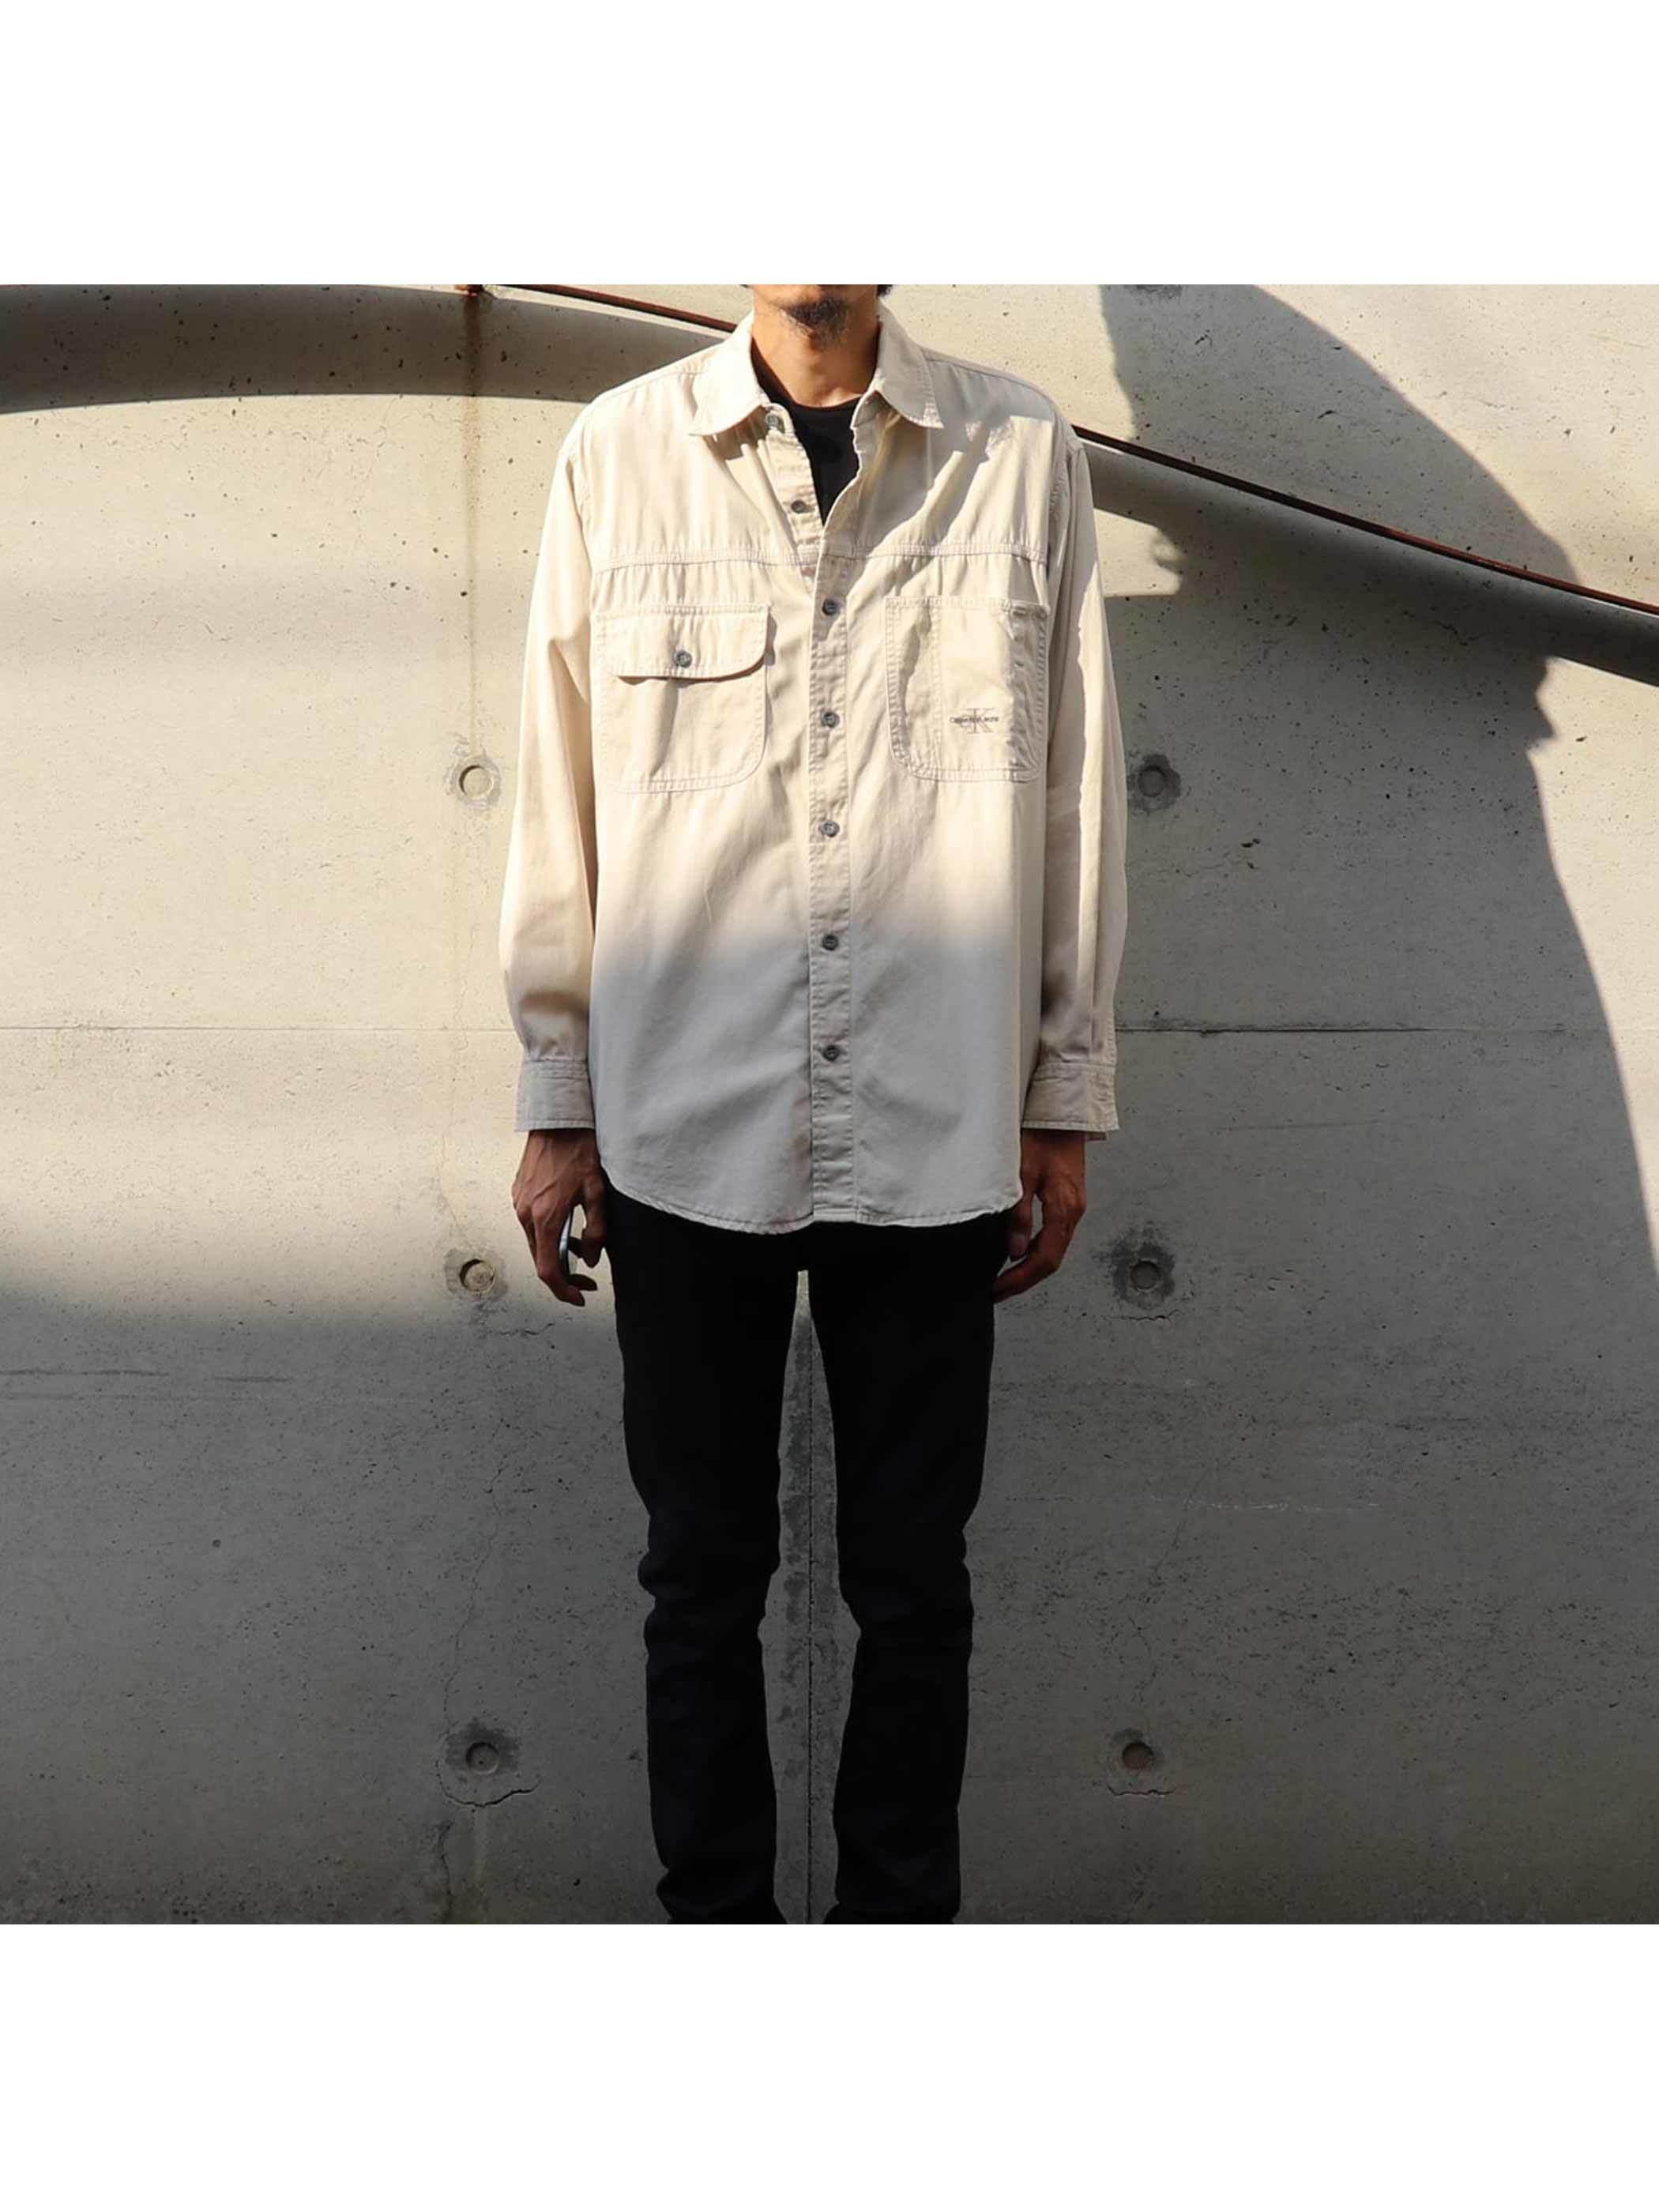 90's CALVIN KLEIN JEANS コットンポプリン ワークシャツ [S]